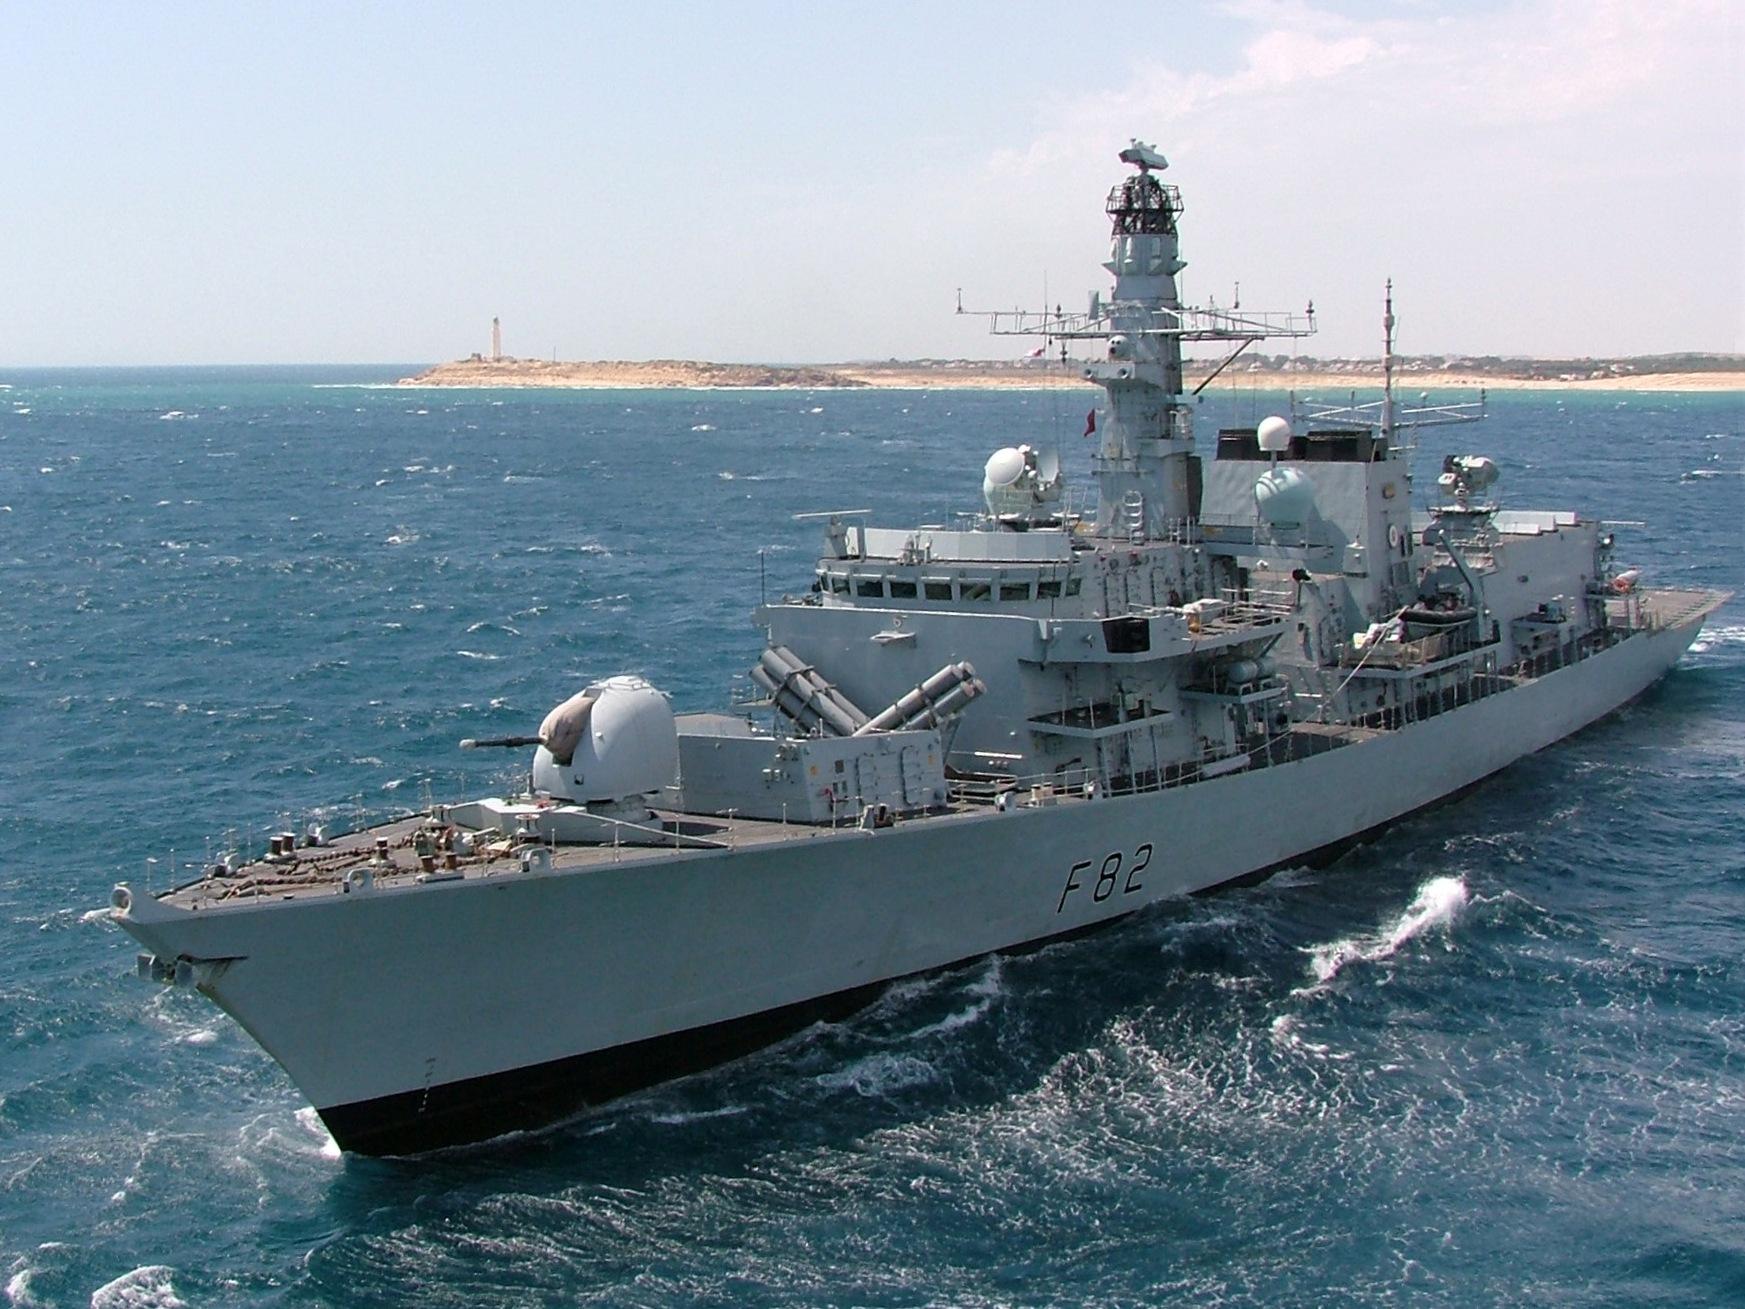 Tri iranska broda pokušala blokirati prolaz britanskom naftnom tankeru